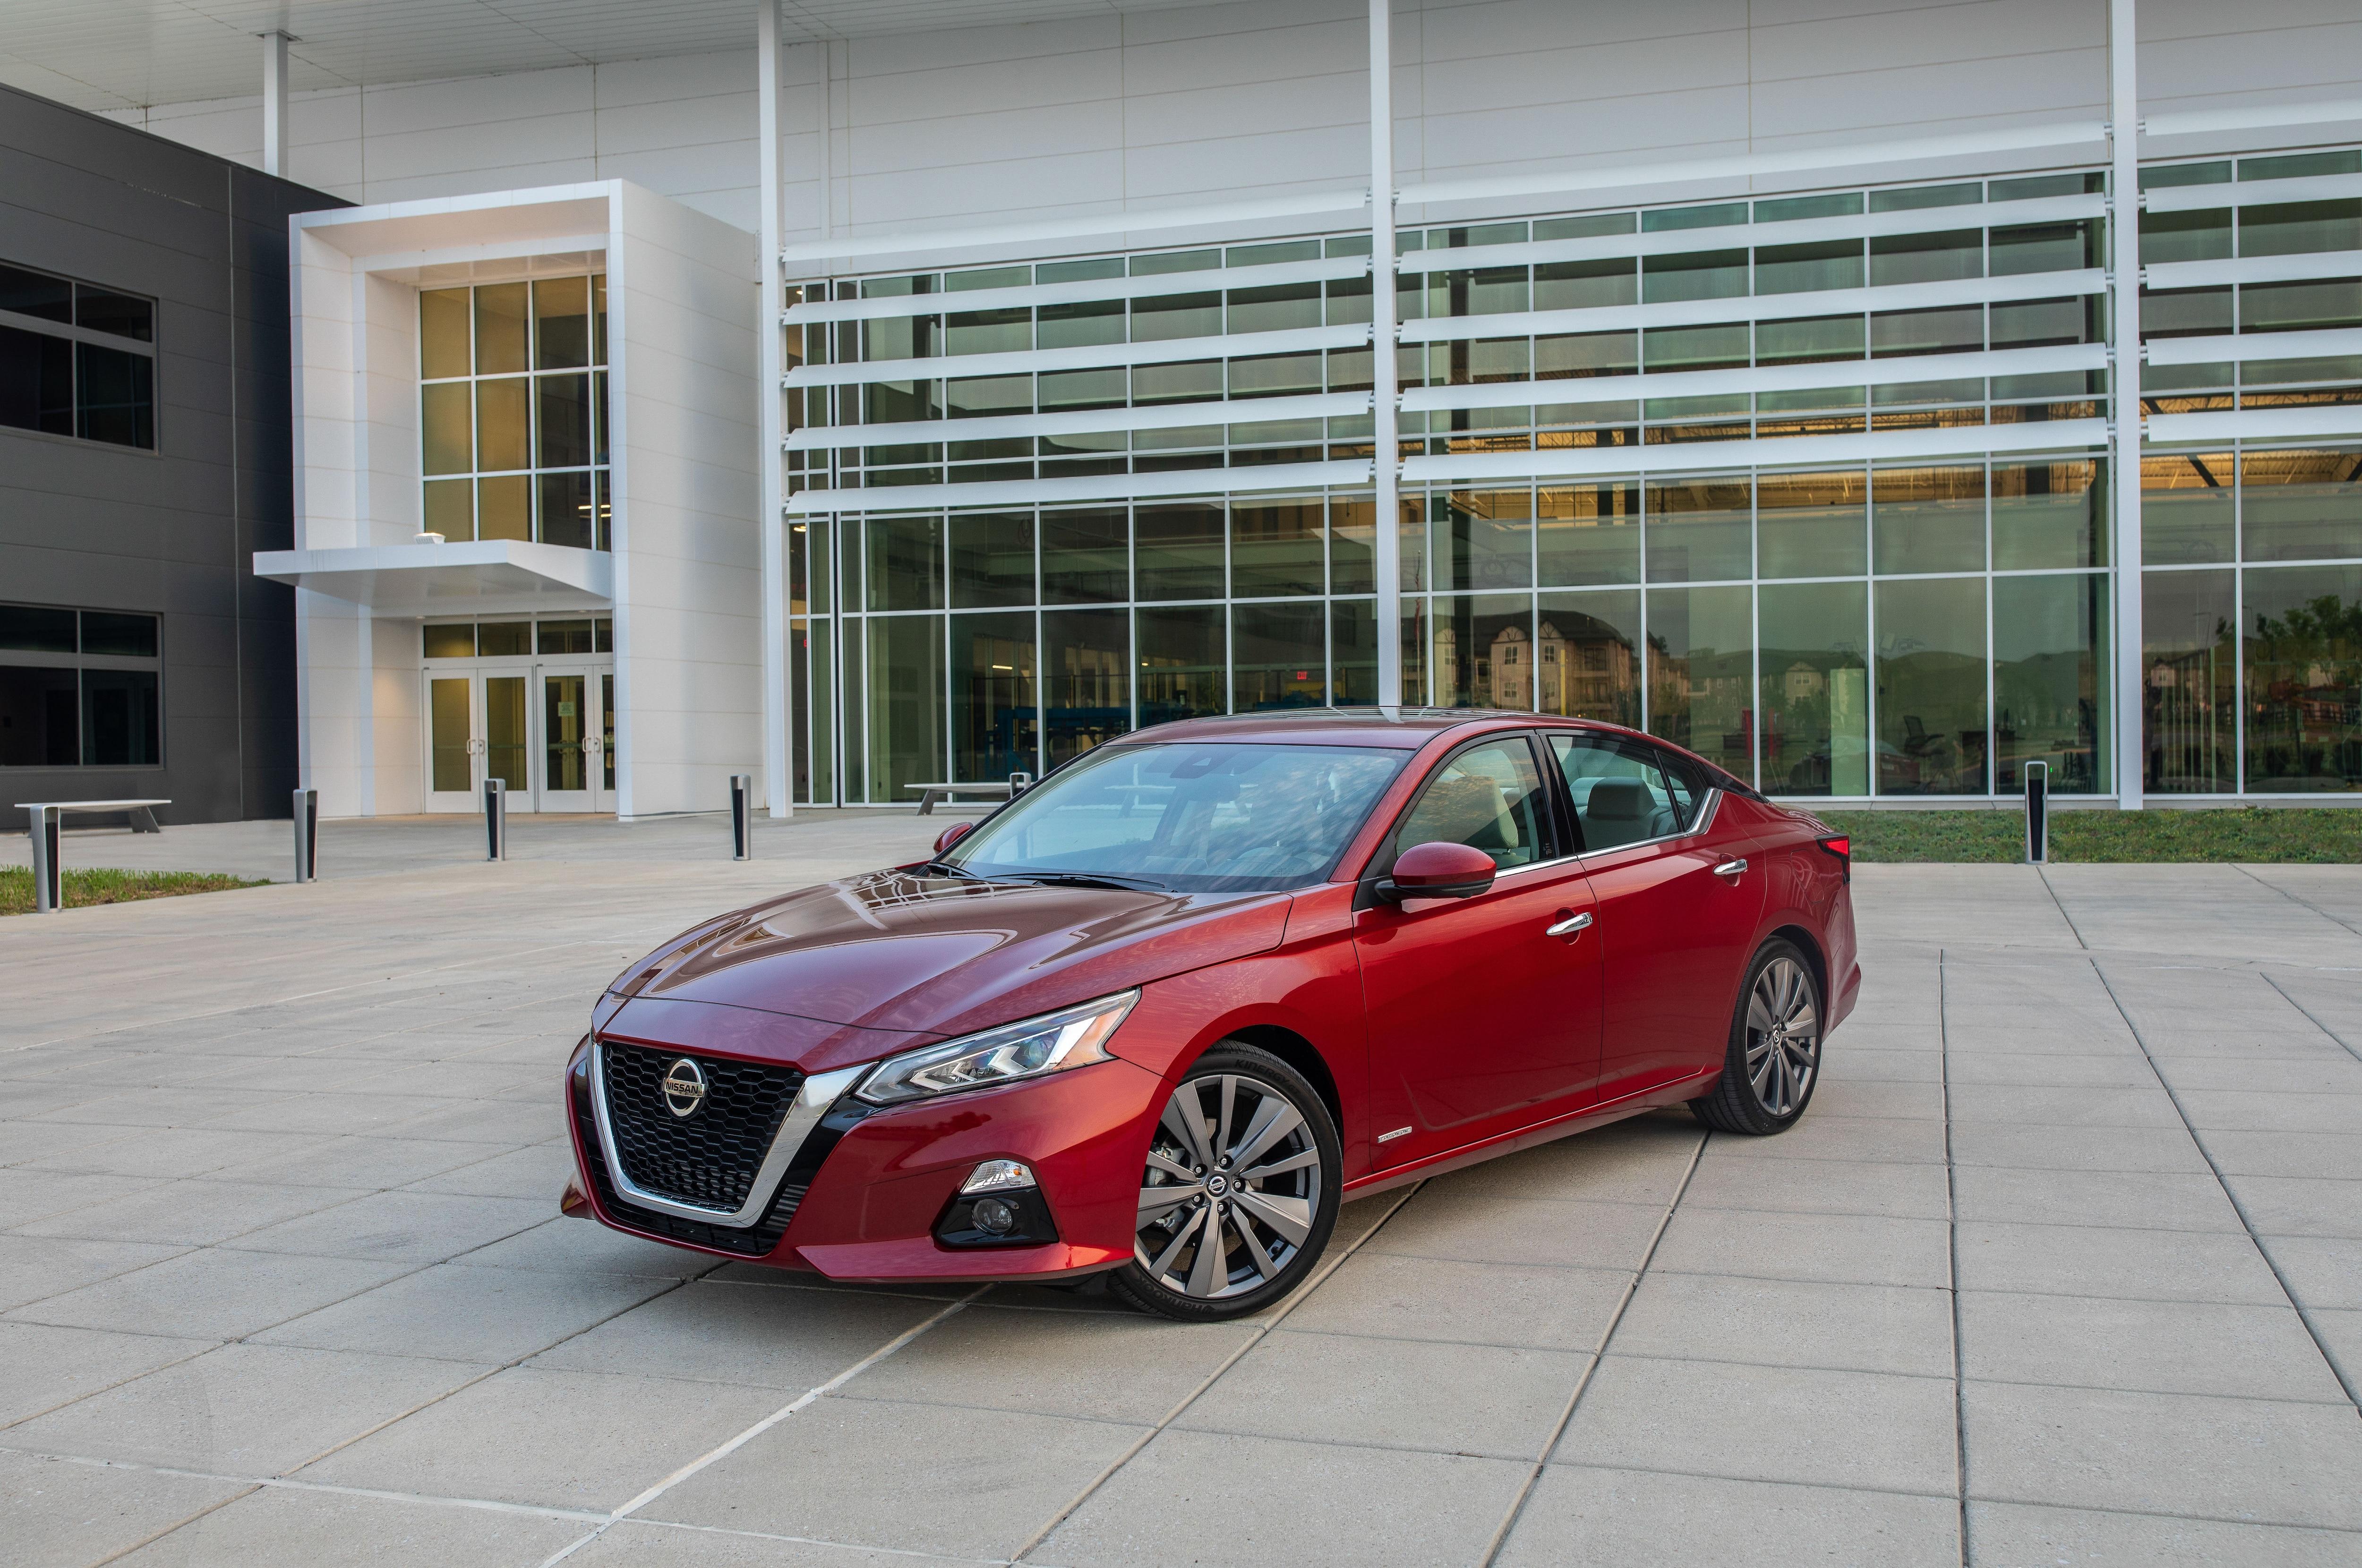 2019 Nissan Altima Prototype Drive %%sep%% %%sitename